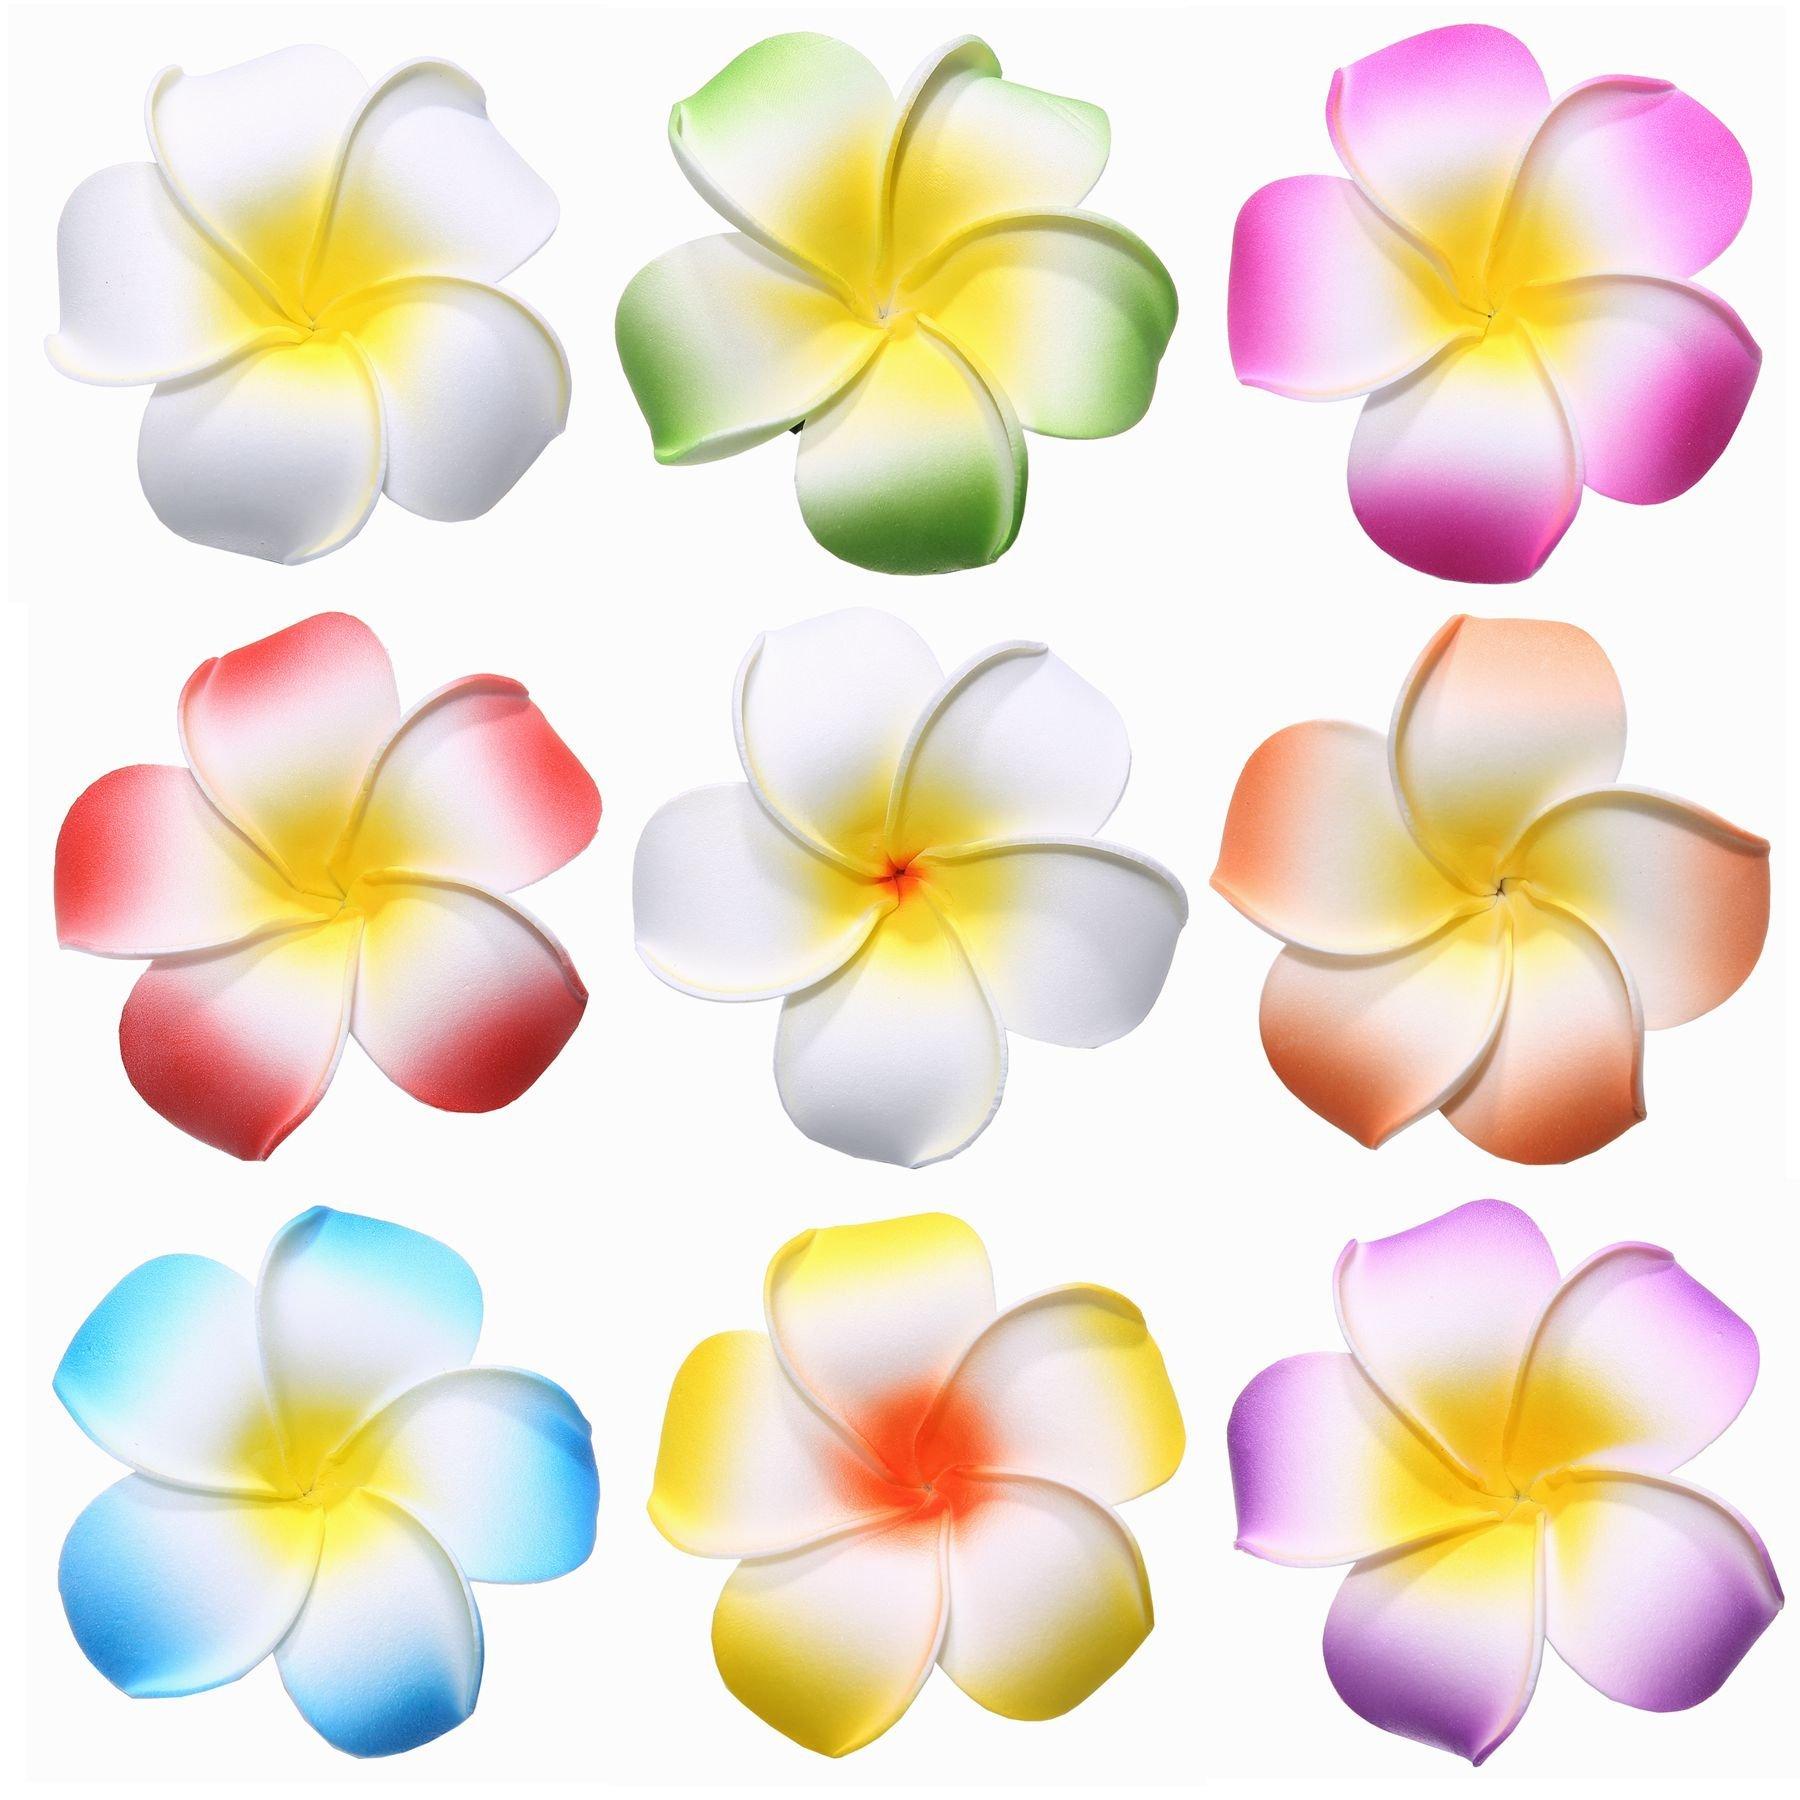 Buy youbami 35 hawaiian plumeria foam flower hair clip accessory youbami 35 hawaiian plumeria foam flower hair clip accessory set of izmirmasajfo